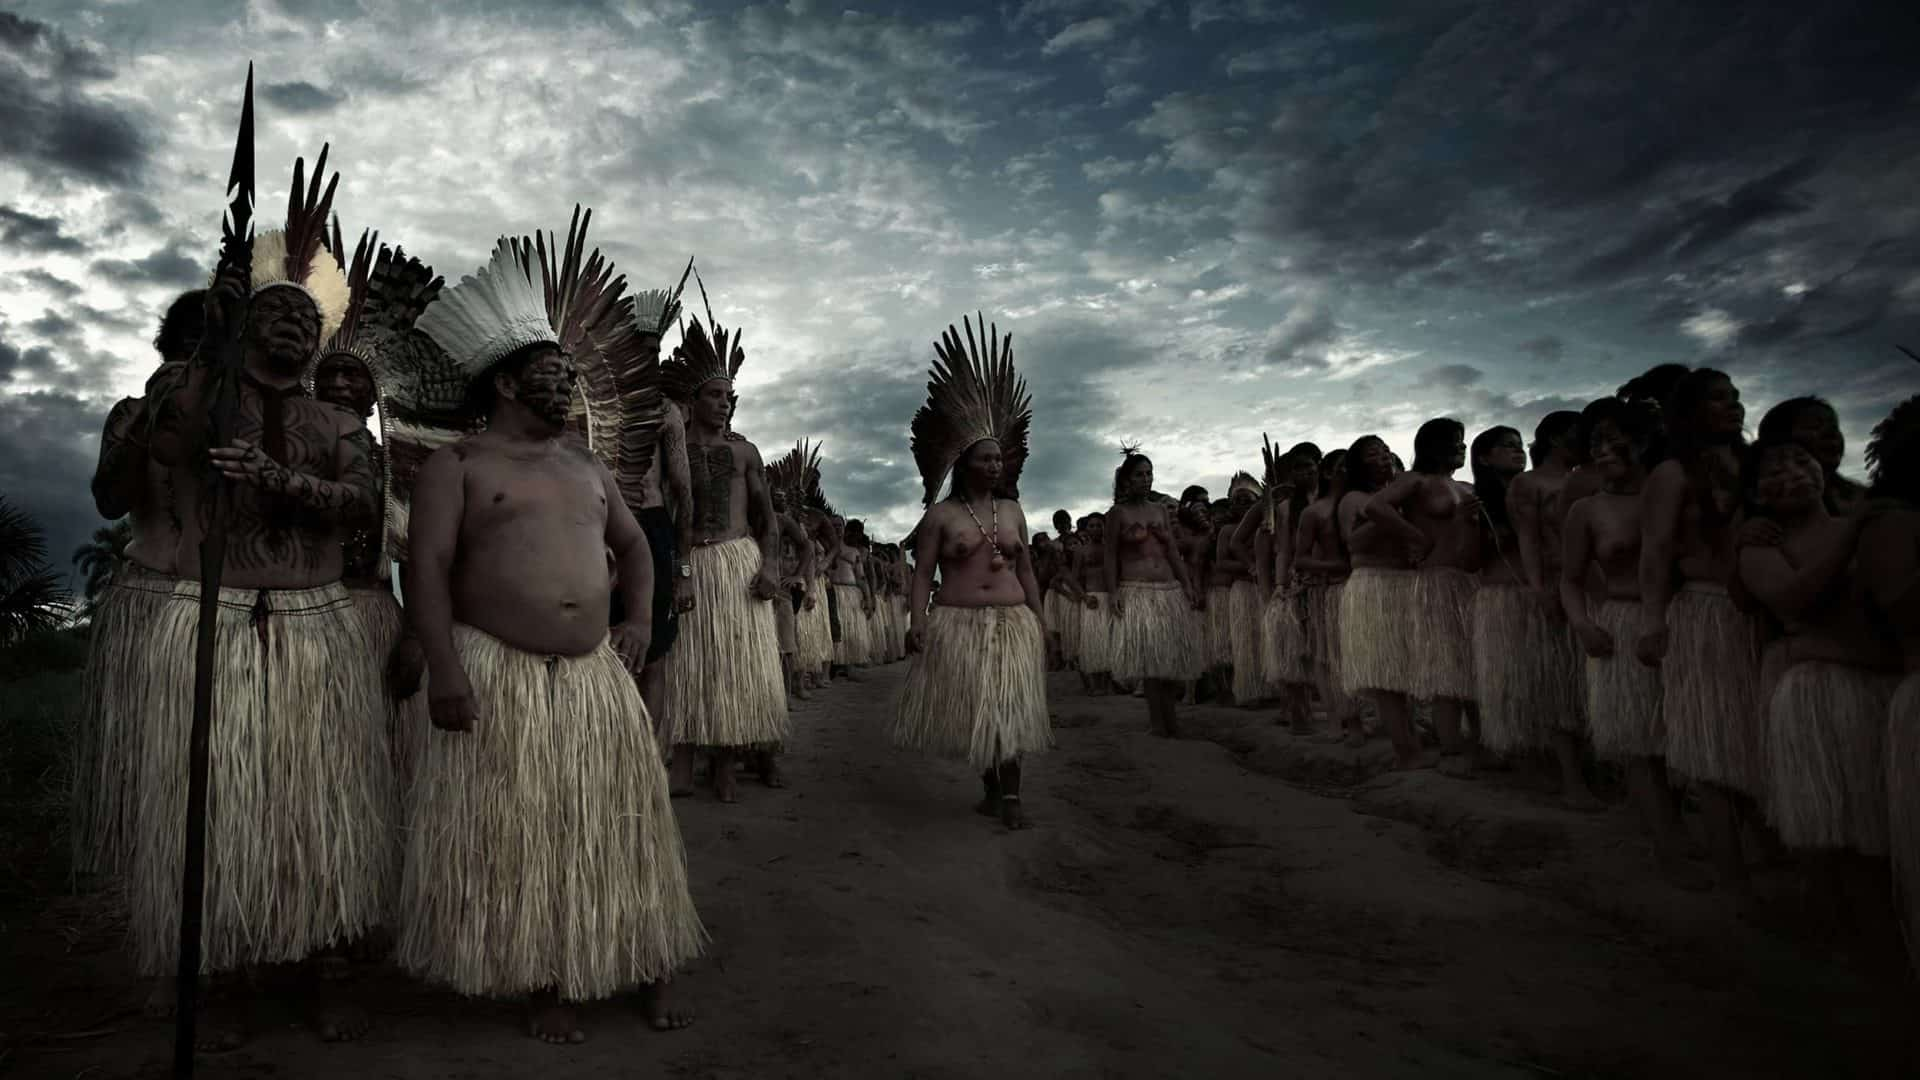 Índigenas da tribo Yawanawá em ritual